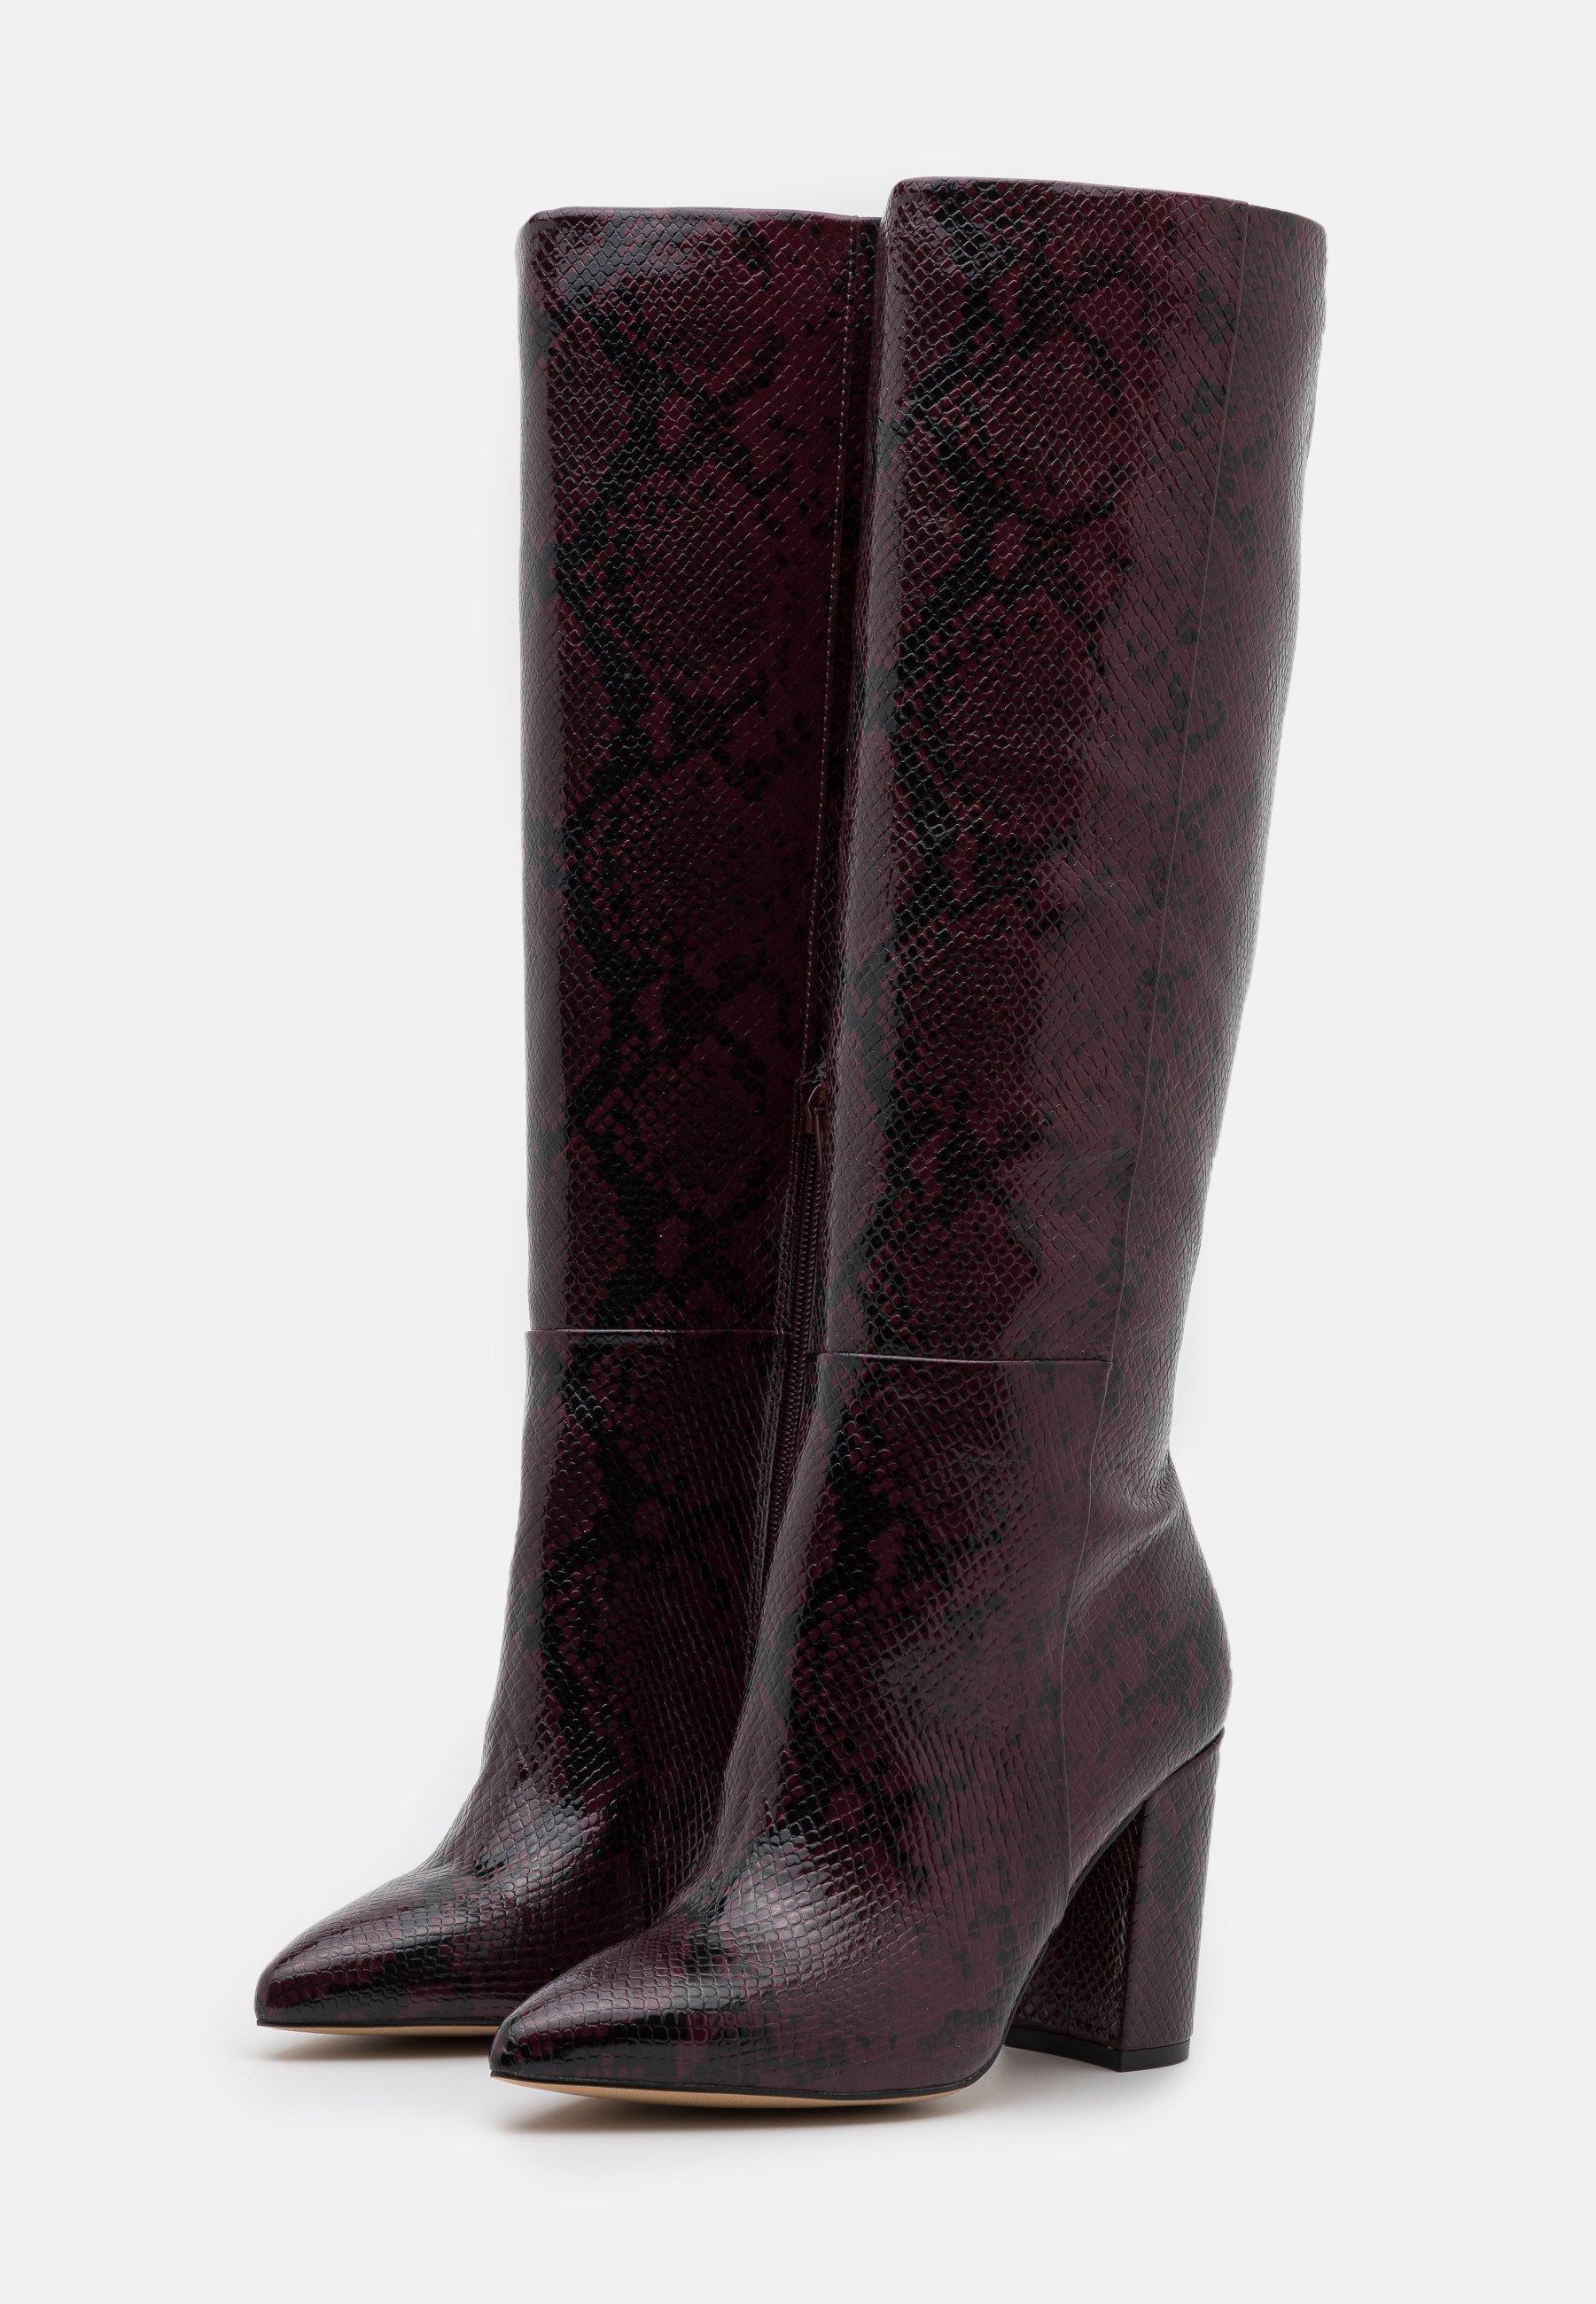 ALDO KINKUNA High Heel Stiefel bordo/rot